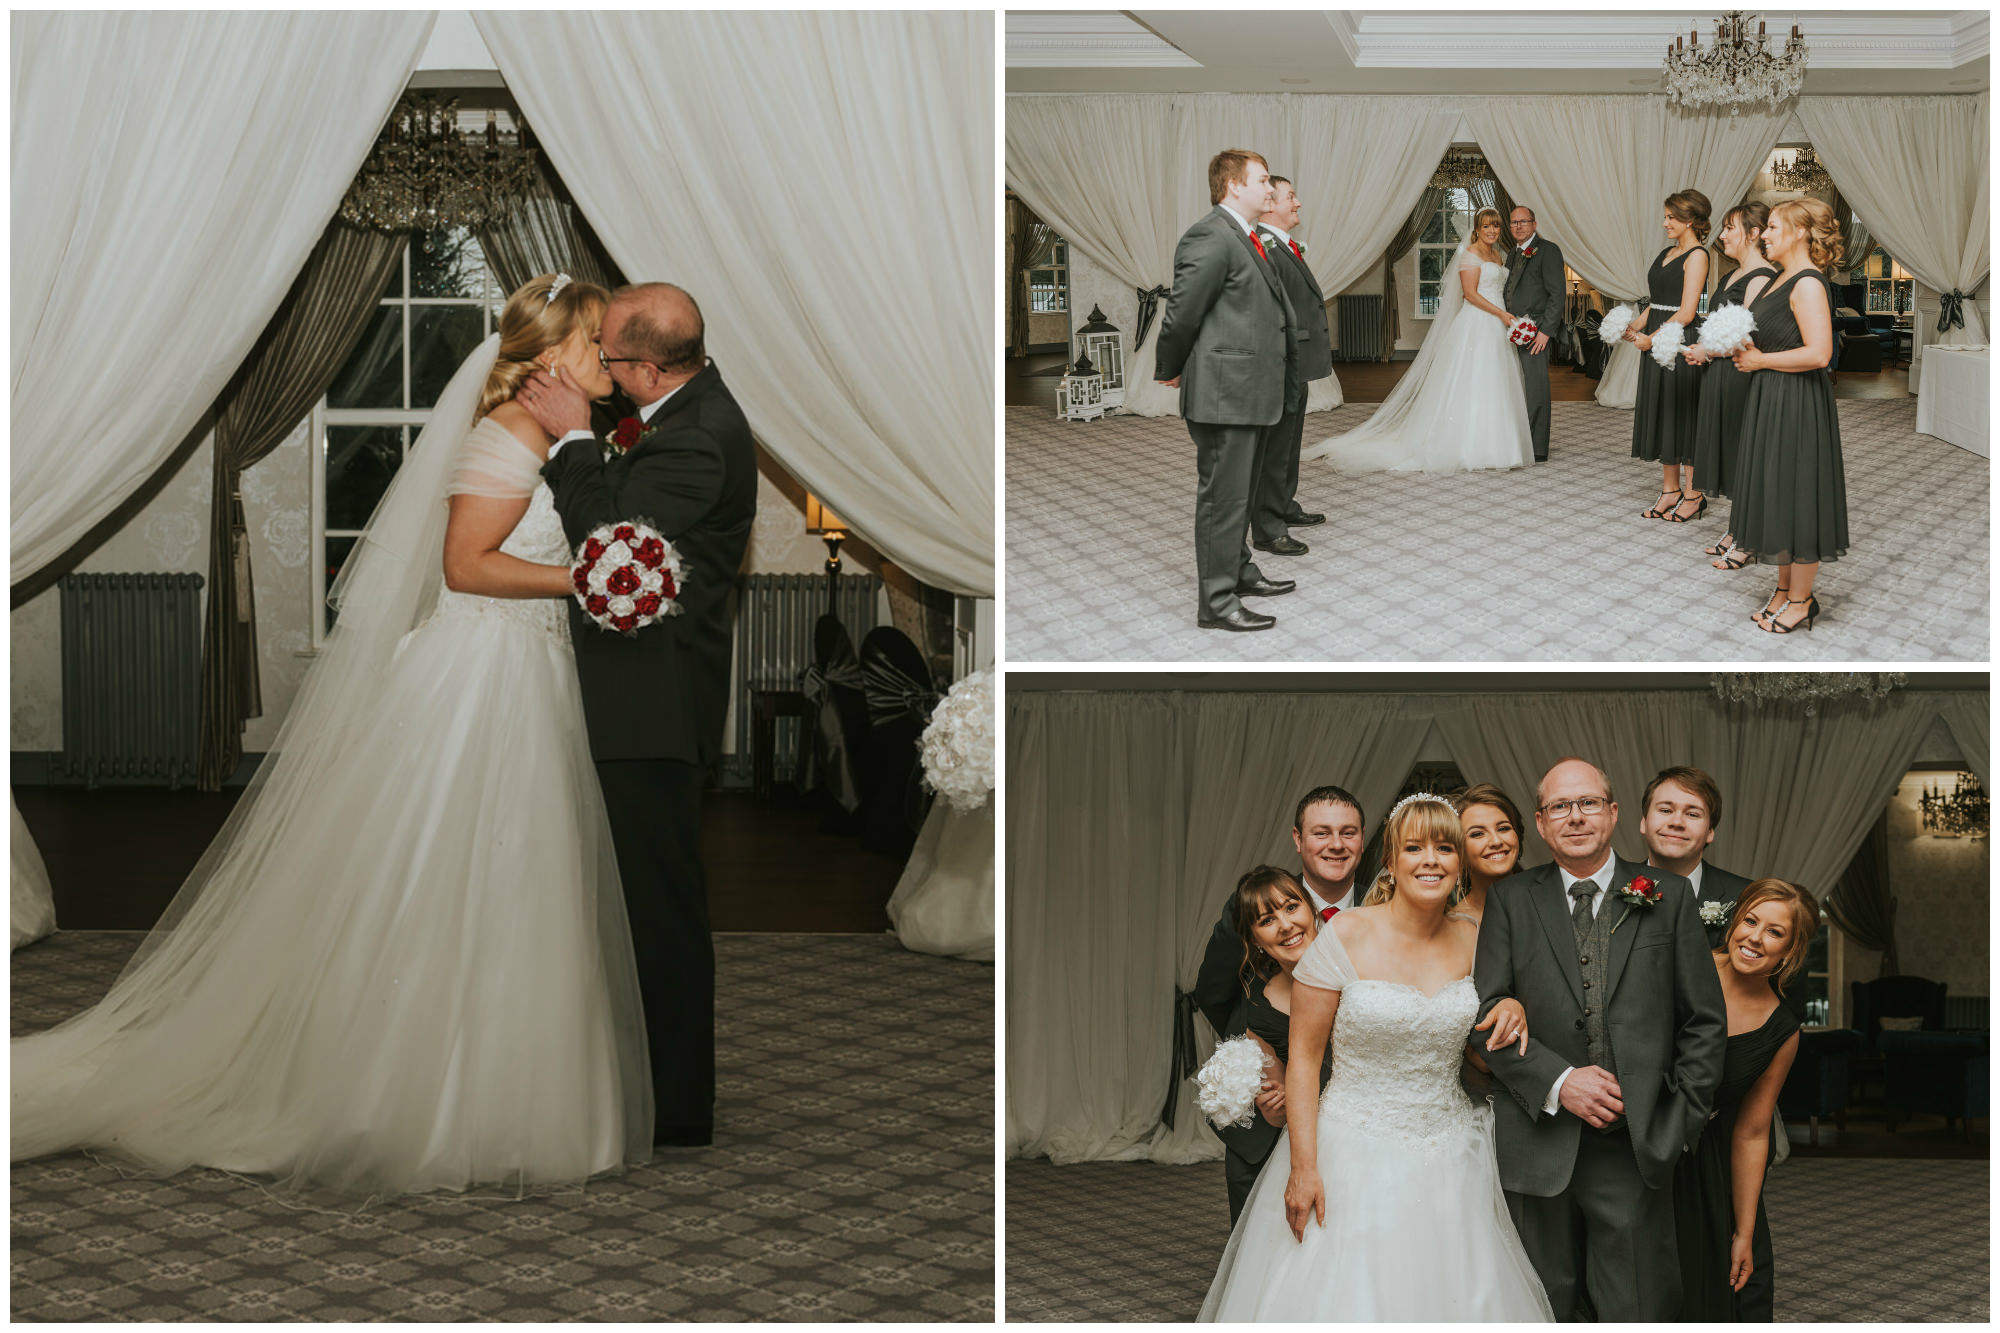 Leighinmohr_House_Hotel_Wedding_Karen_and_Garnet_61